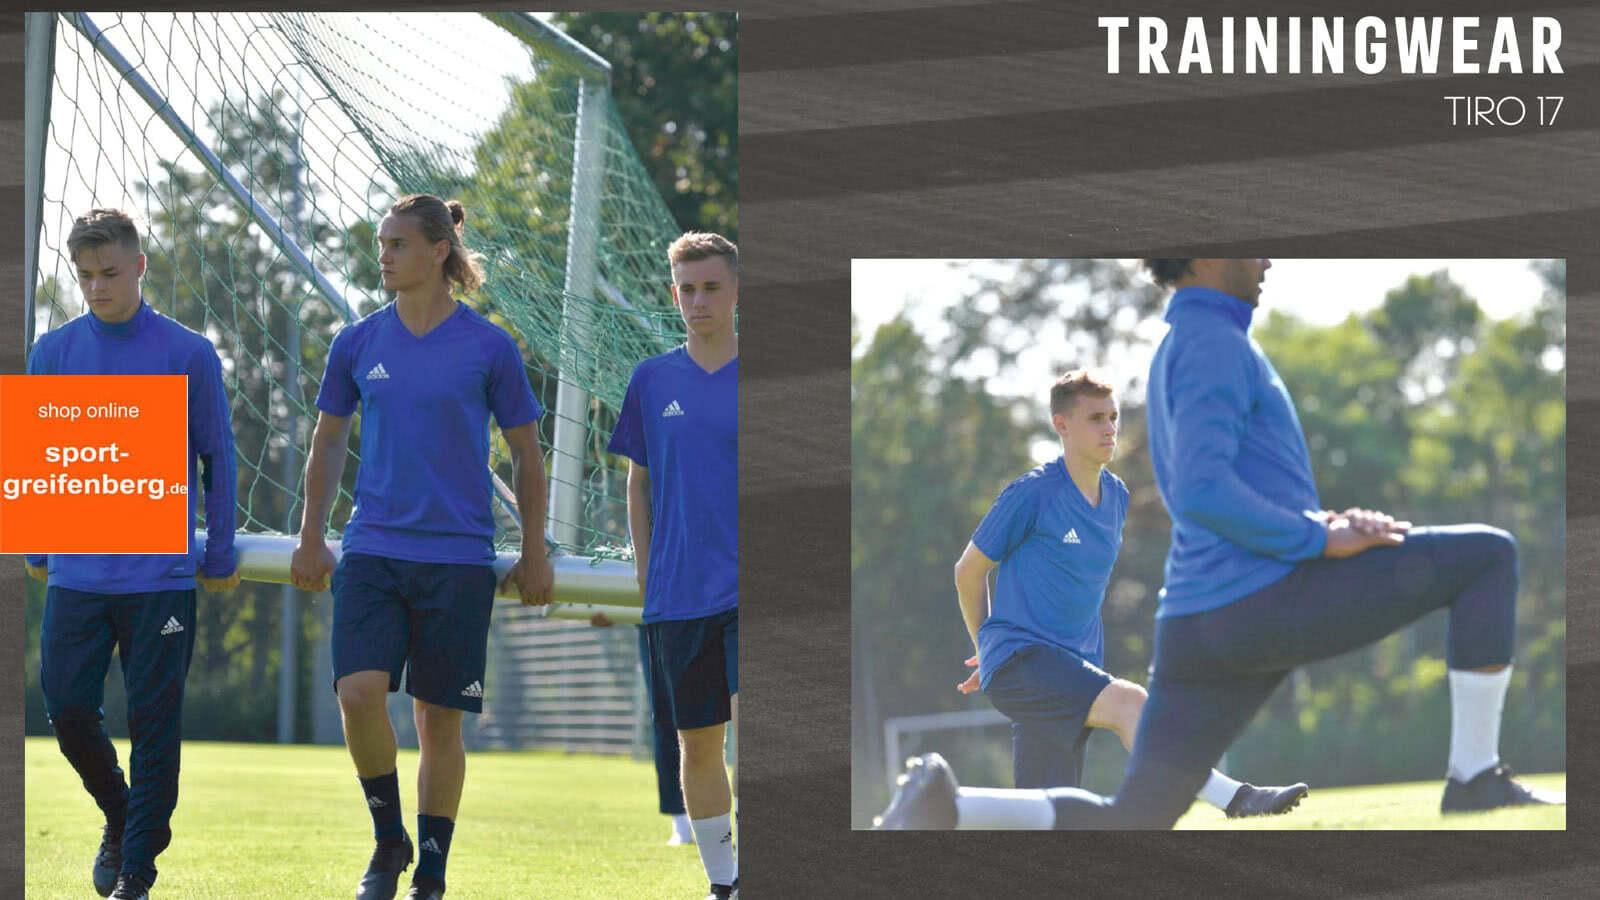 Adidas Tiro 17 Teamline Sportartikel